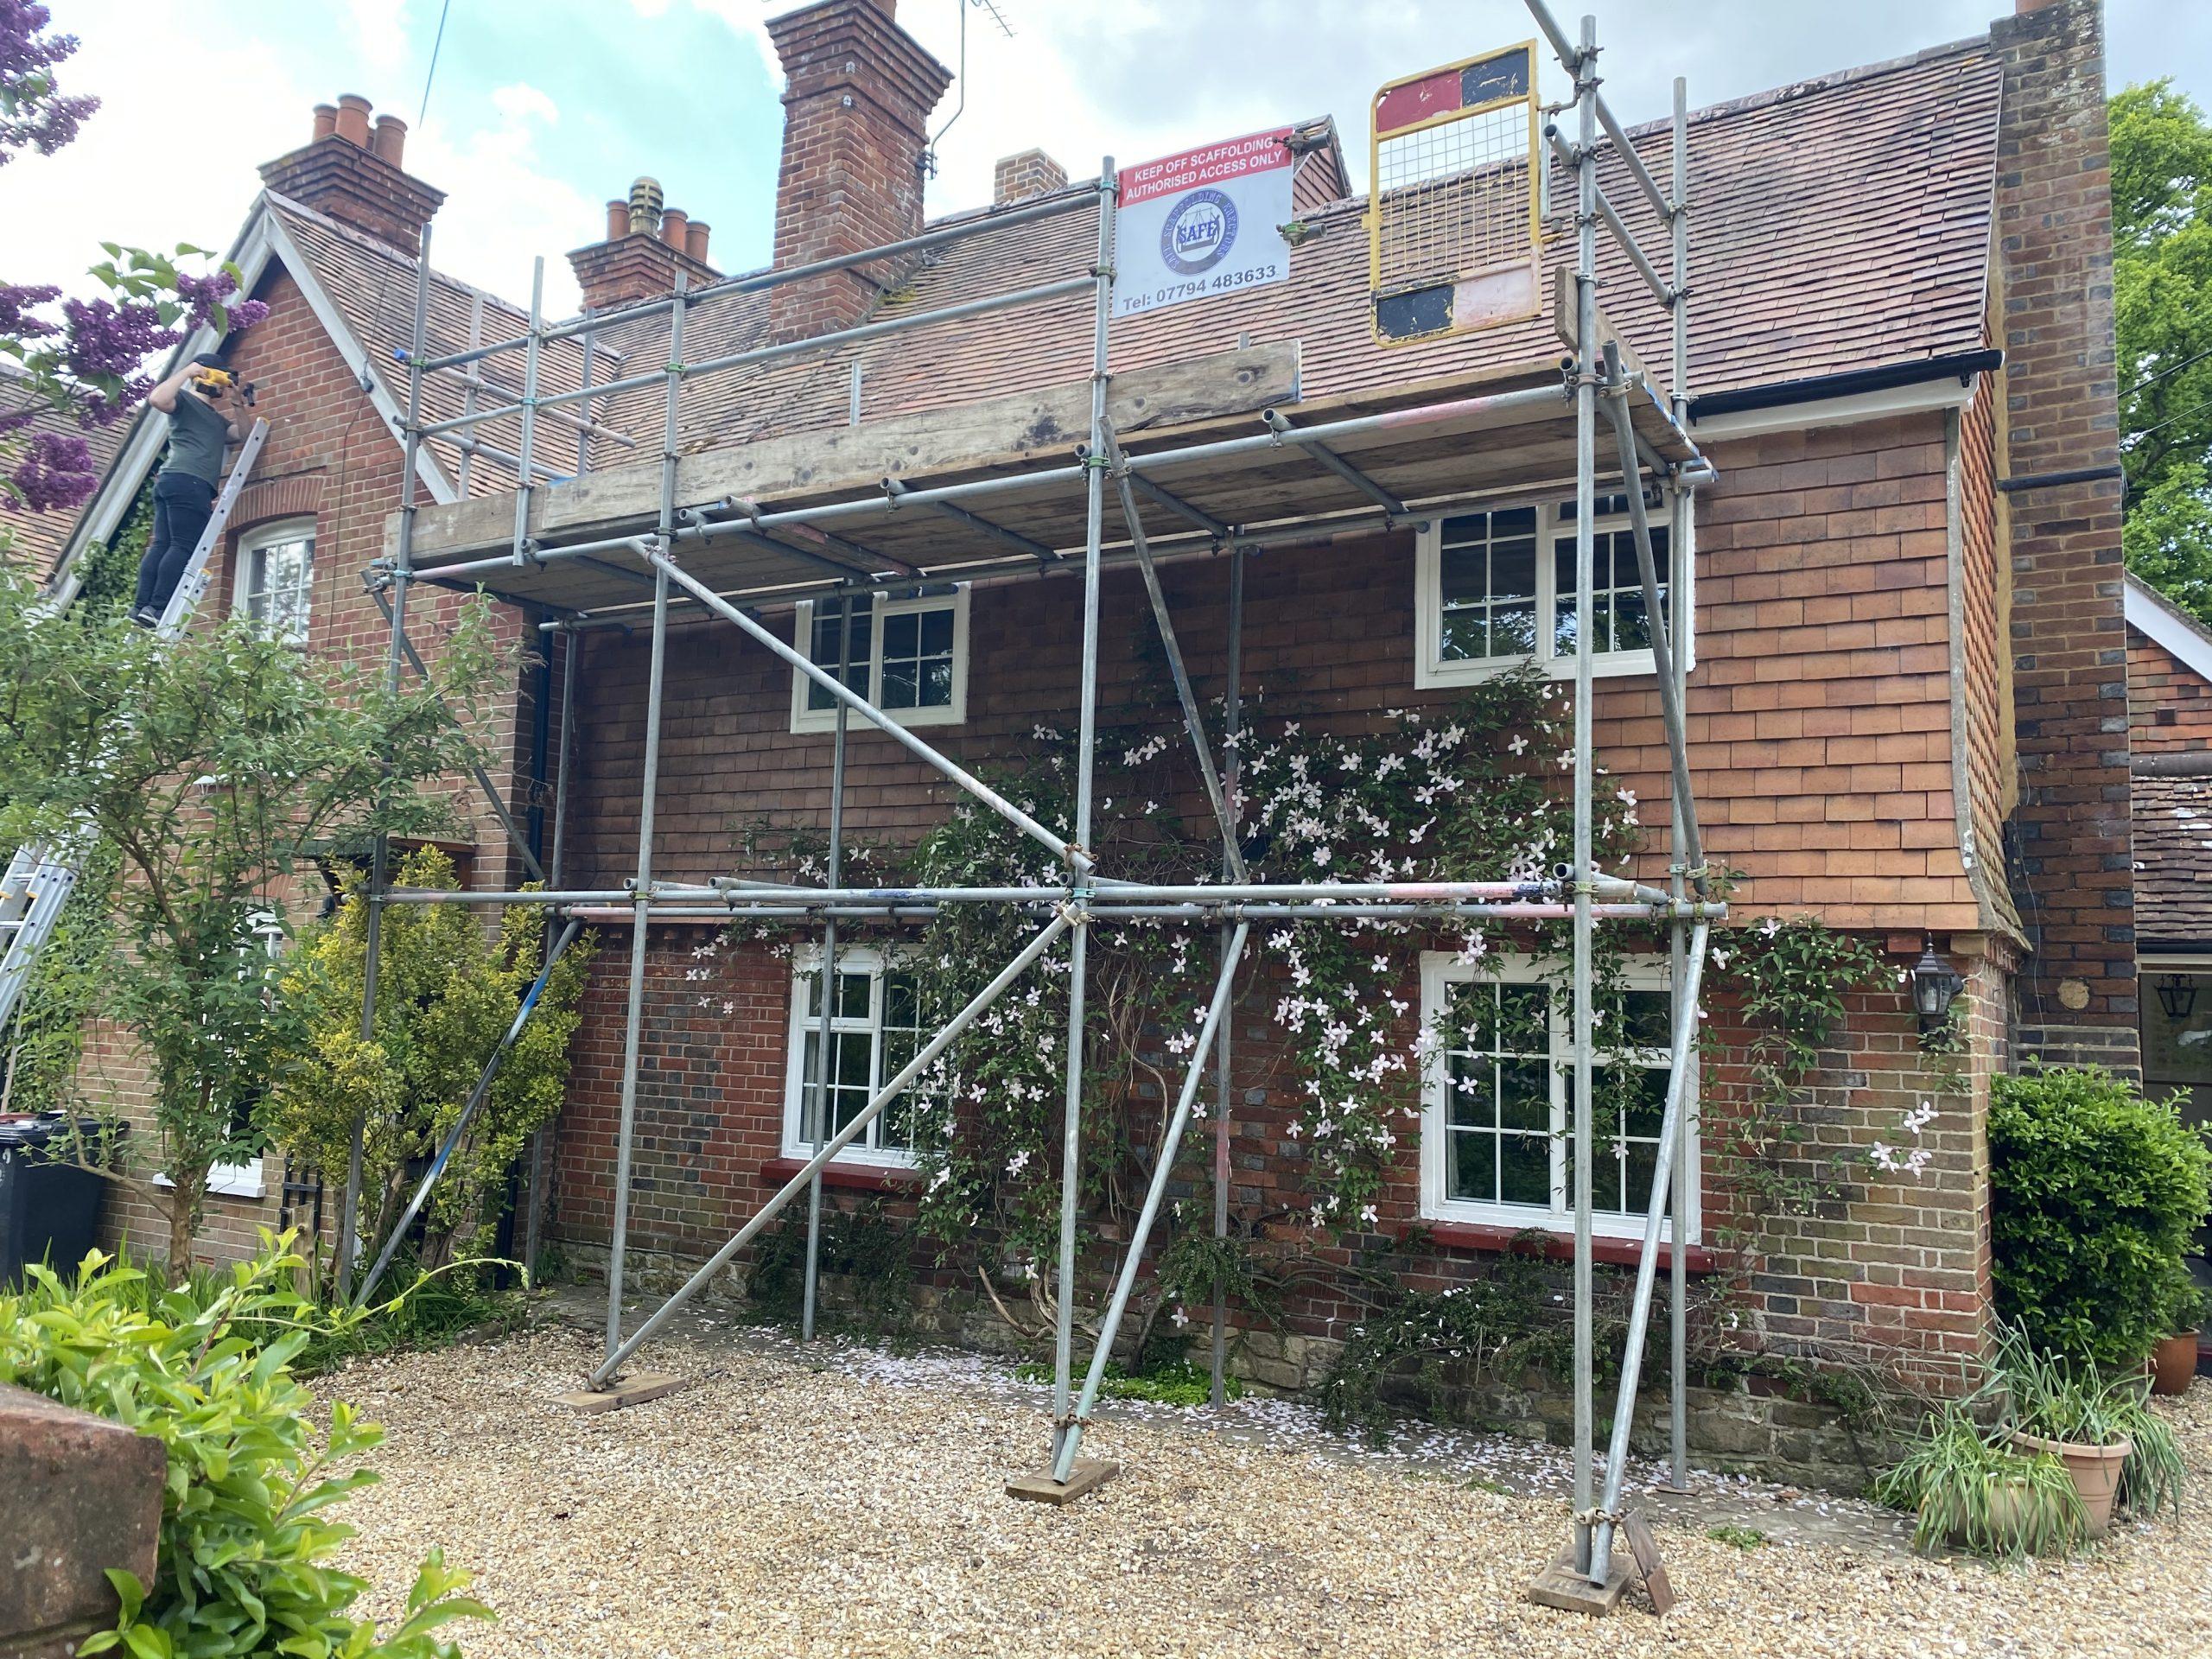 Scaffolding work Residential scaffolding